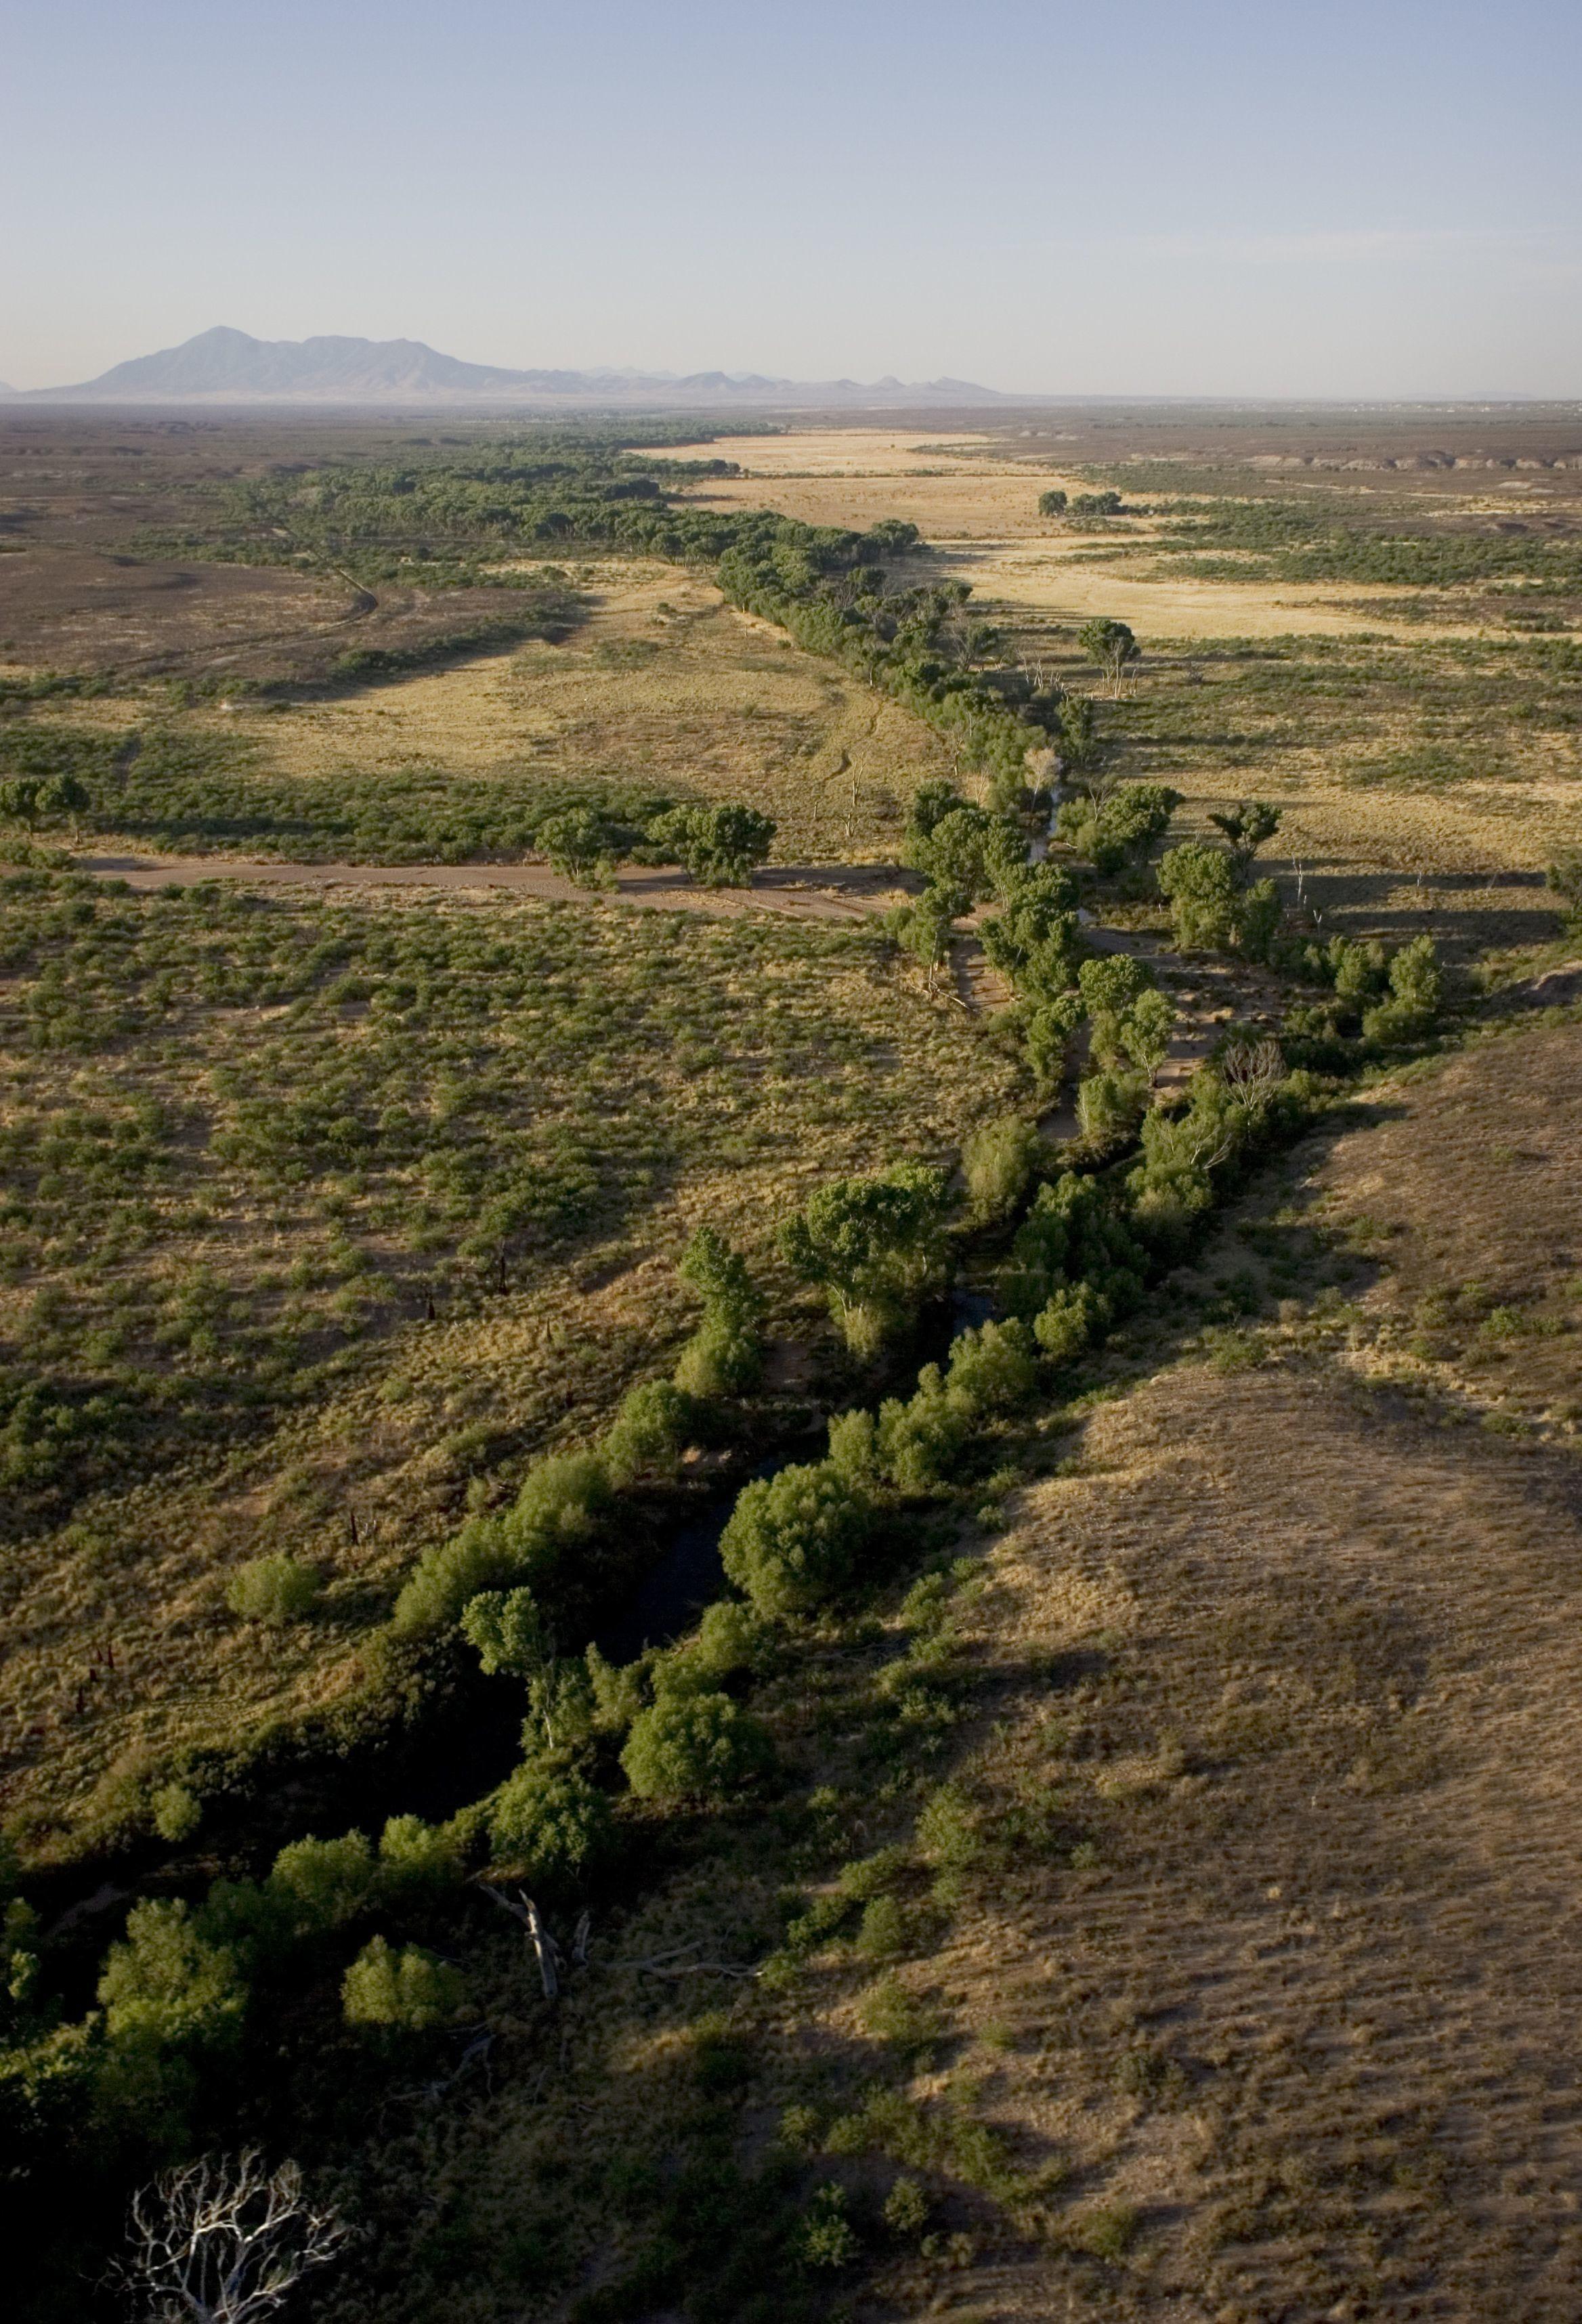 The San Pedro River snakes its way through the desert east of Sierra Vista in southeastern Arizona.